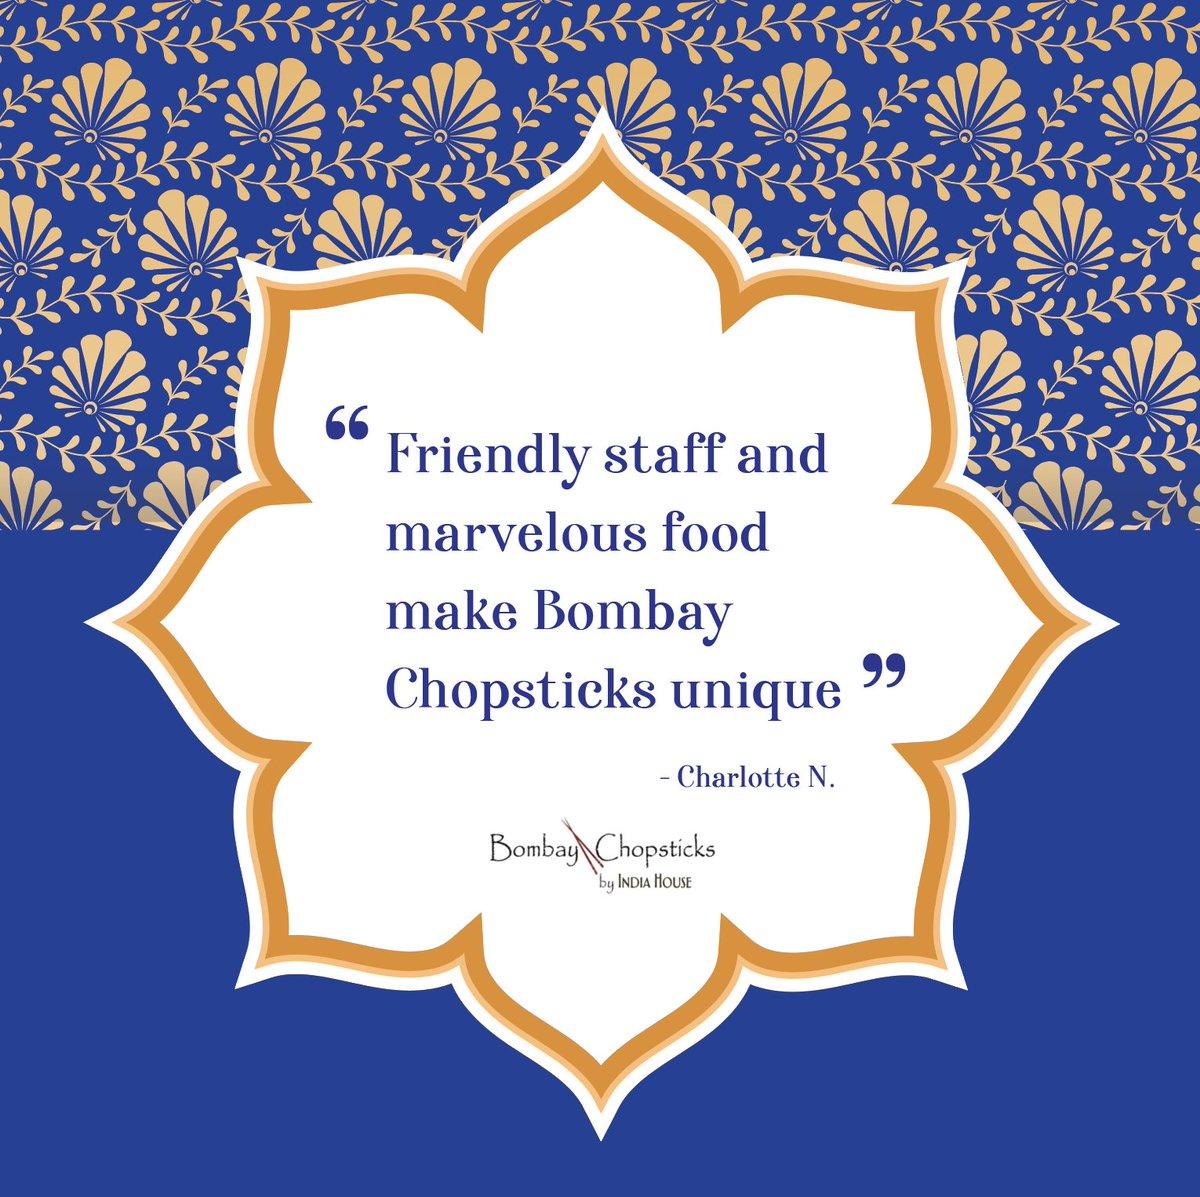 💙💙💙💙 . . . #bombaychopsticks #bombaychopsticksbyindiahouse #chicagorestaurants #Chicagoeats #NapervilleIL #NapervilleBusiness #HoffmanEstatesIL #ChicagoEats #Foodie #ChicagoFoodie #NapervilleEats #PhotooftheDay #Instagood #Monday #EatYourColors #TastetheRainbow#Chopsticks ... https://t.co/t3CGYlx8zx